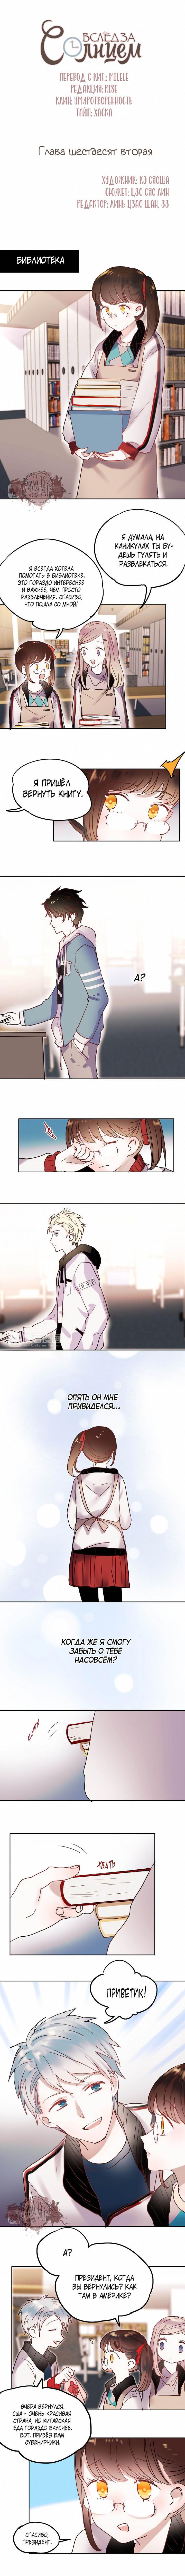 https://r2.ninemanga.com/comics/pic3/38/31270/1301577/1547678926574.jpg Page 1